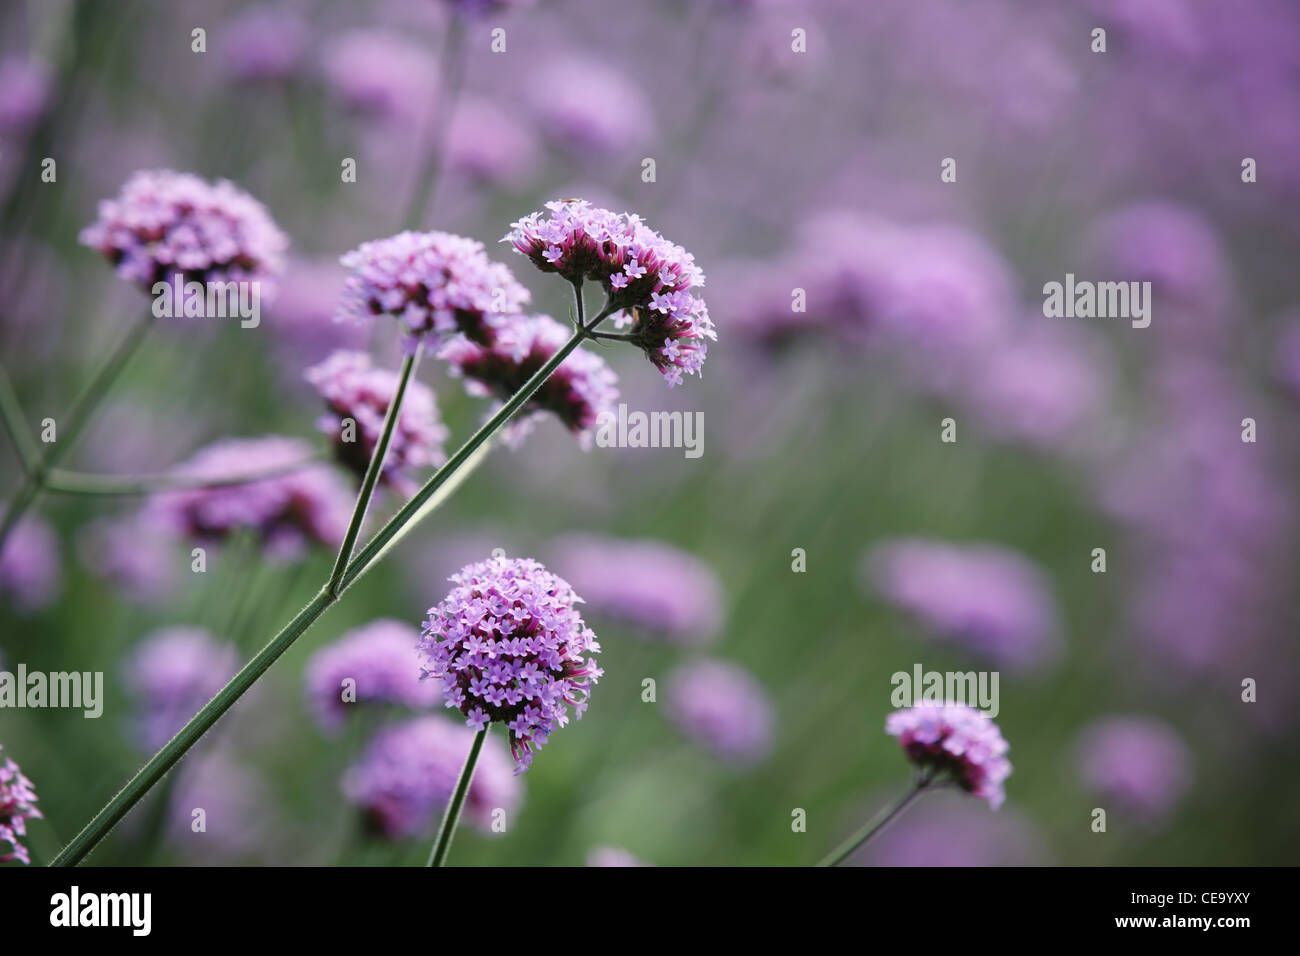 Nature beautiful flower buds stock photos nature beautiful flower purple flowers on beautiful bokeh background stock image izmirmasajfo